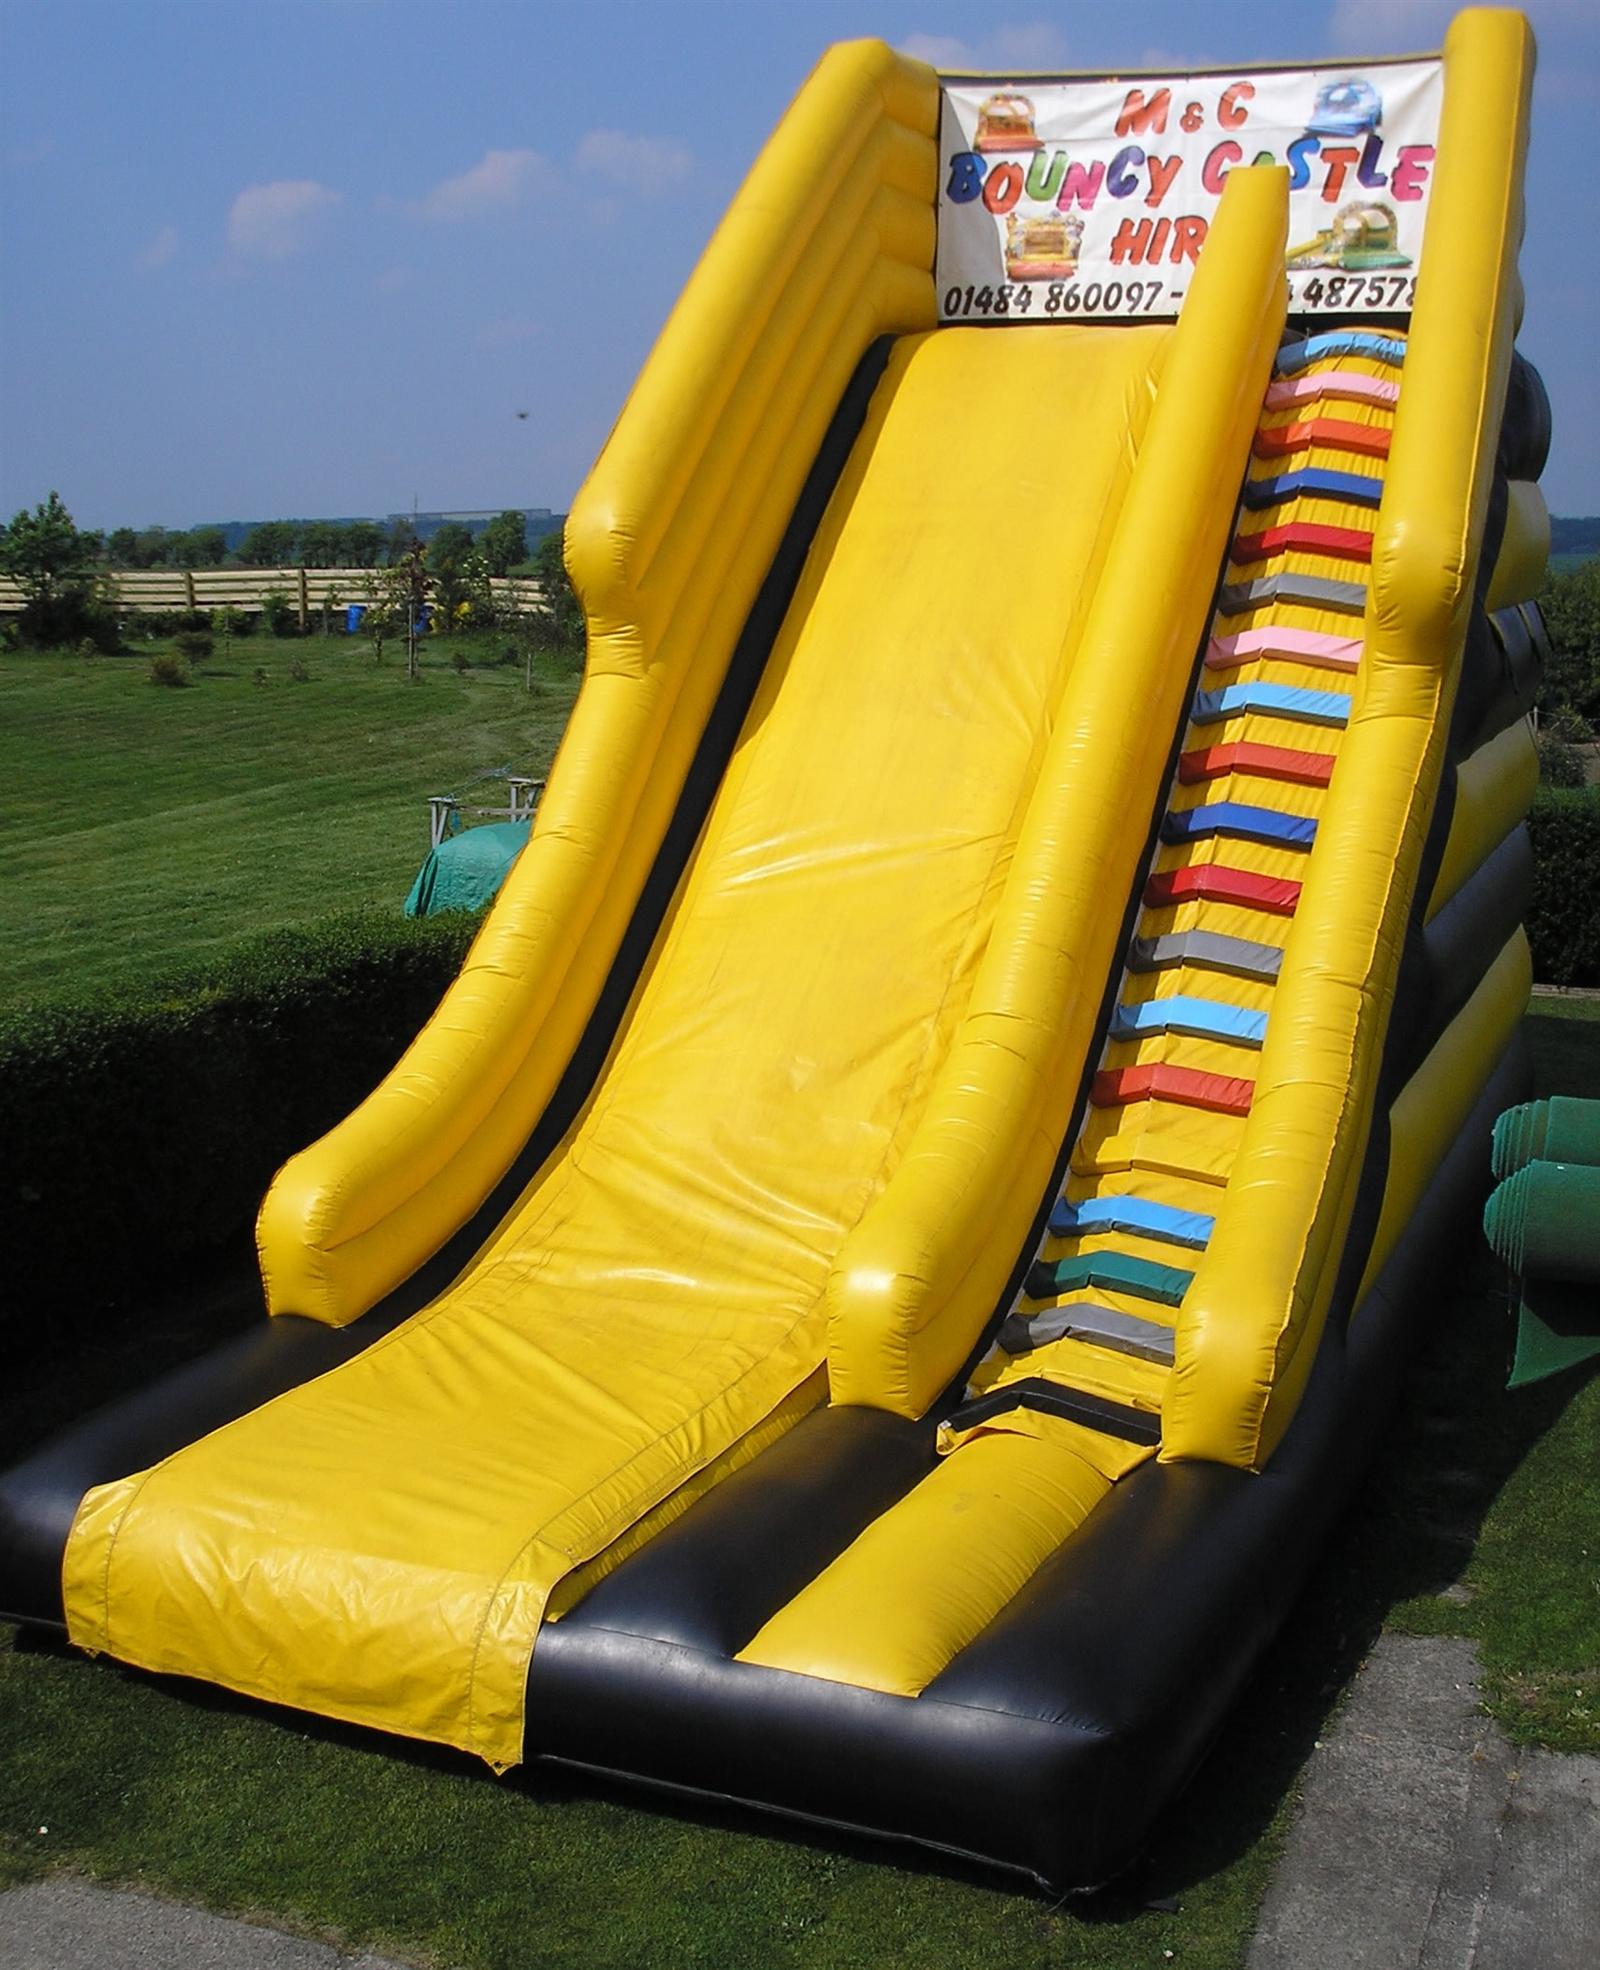 Inflatable Slide Hire Uk: Inflatable Slide Hire In Huddersfield & Wakefield